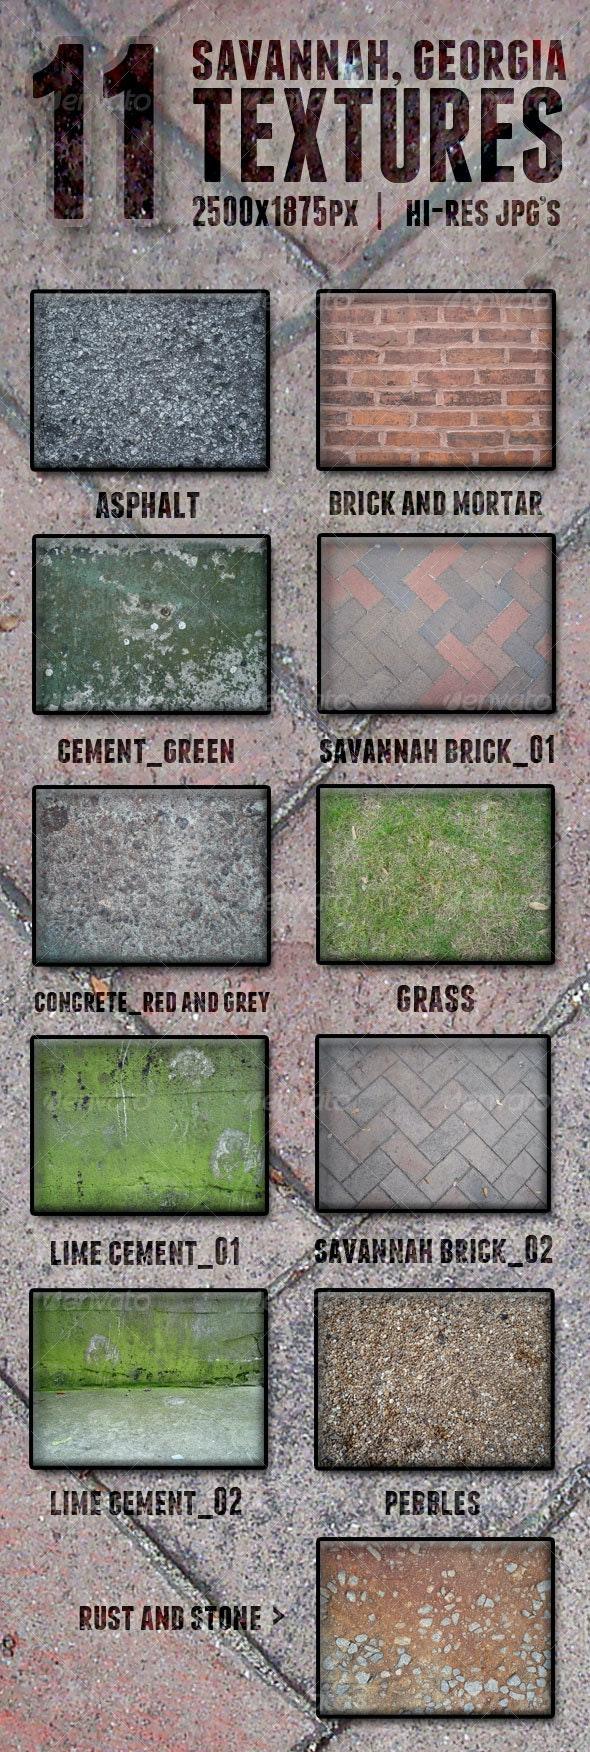 Savannah Textures - Miscellaneous Textures